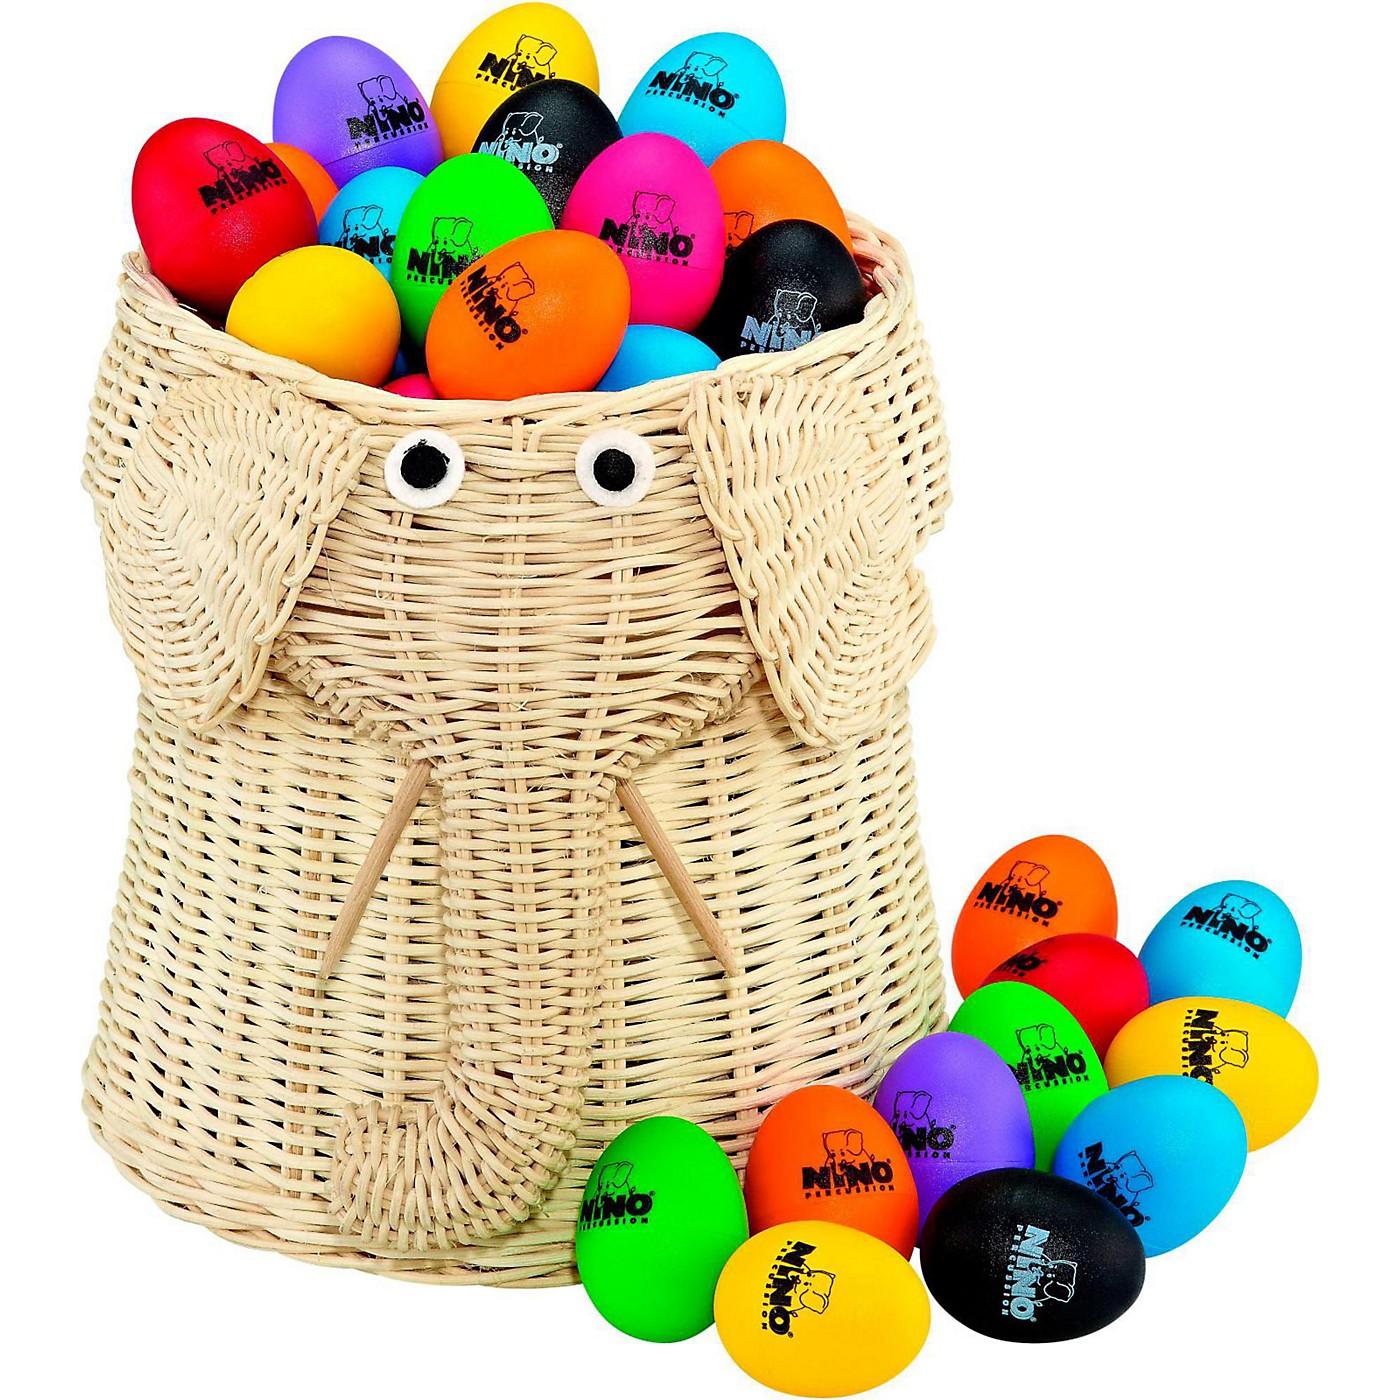 Nino Plastic Egg Shaker 80-Piece Assortment with Basket thumbnail